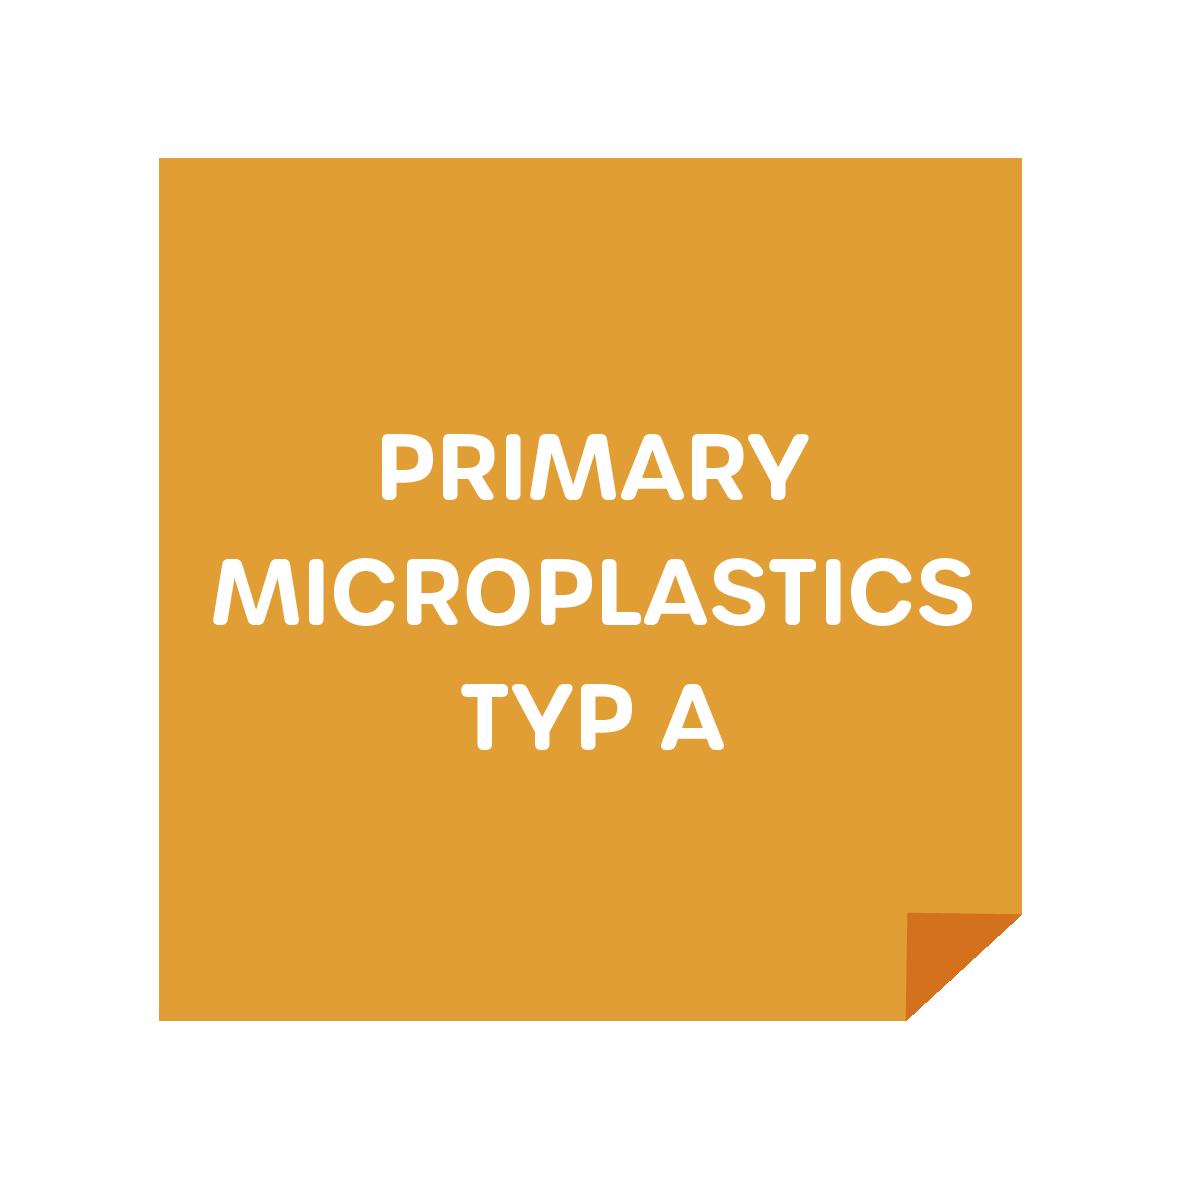 Primary Microplastics Typ A